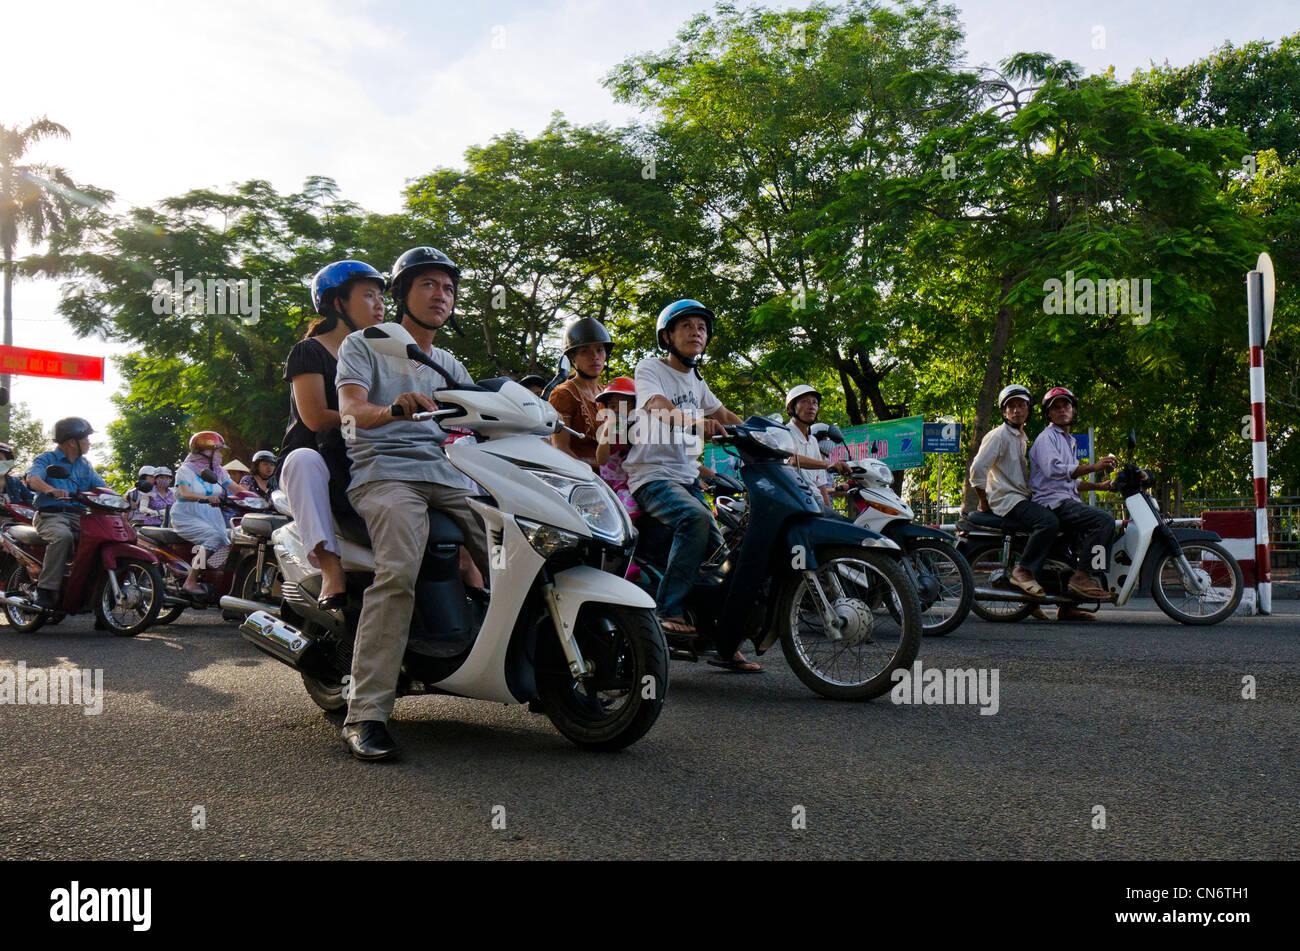 Motorbikes at Traffic Lights, Hue, Vietnam - Stock Image